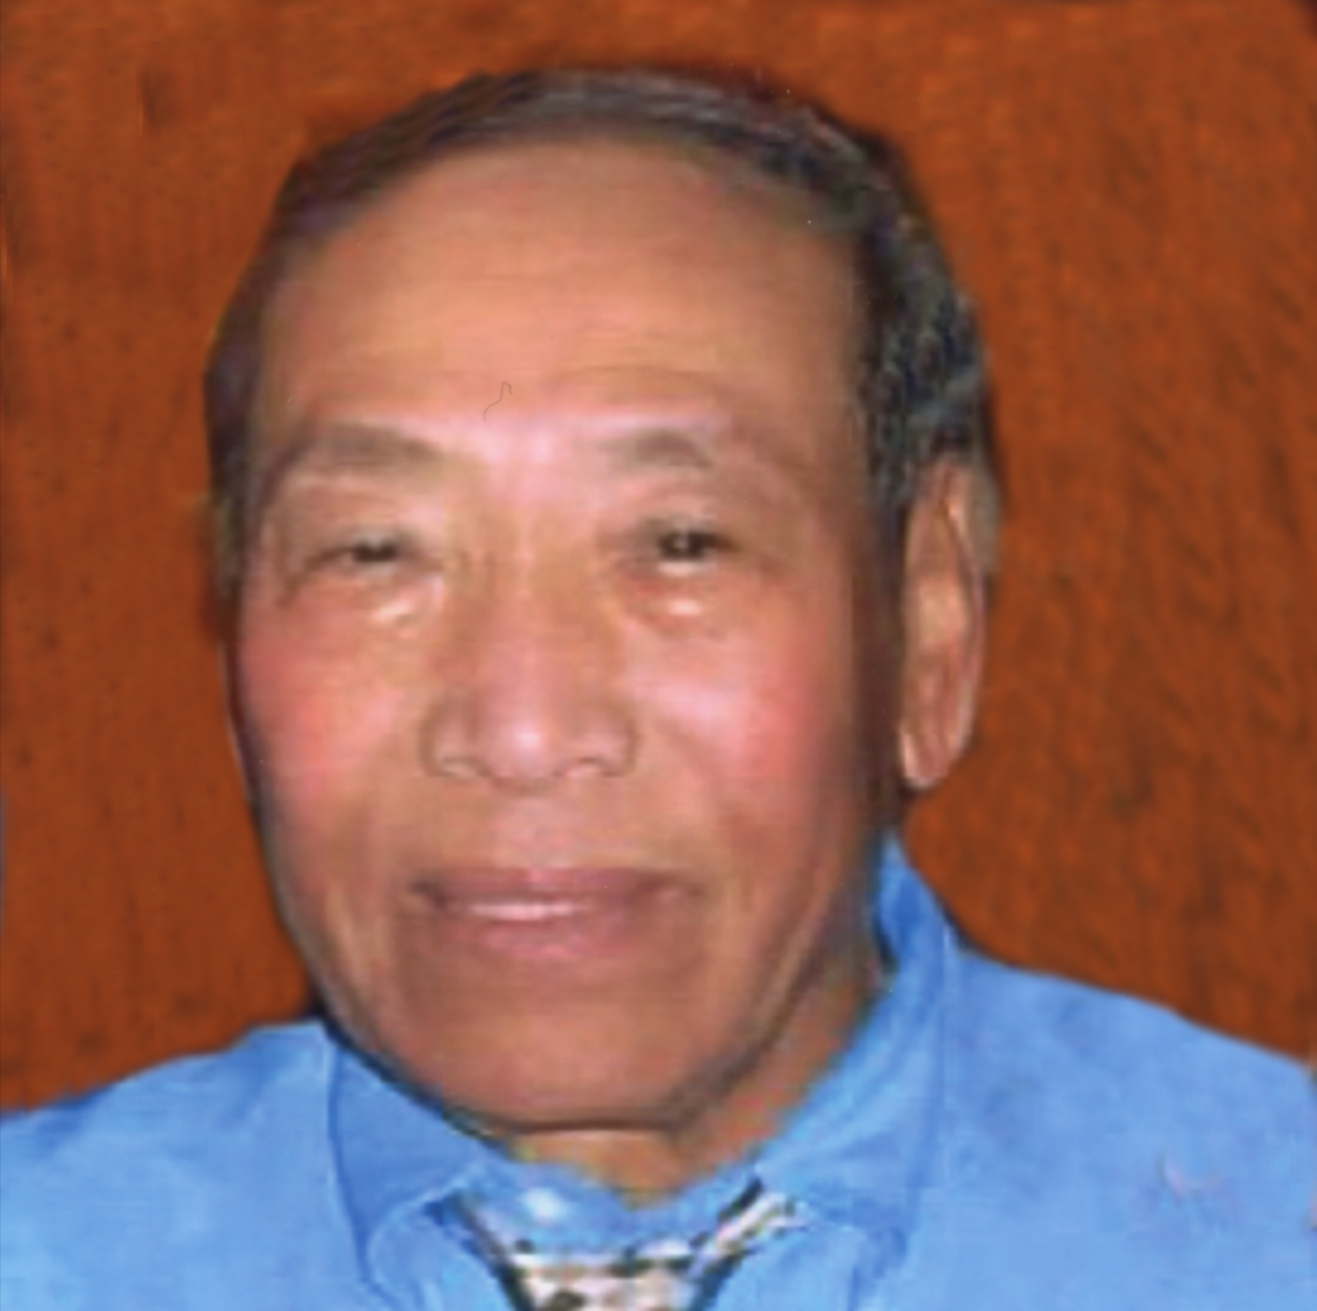 Sokhom Sei of Lowell